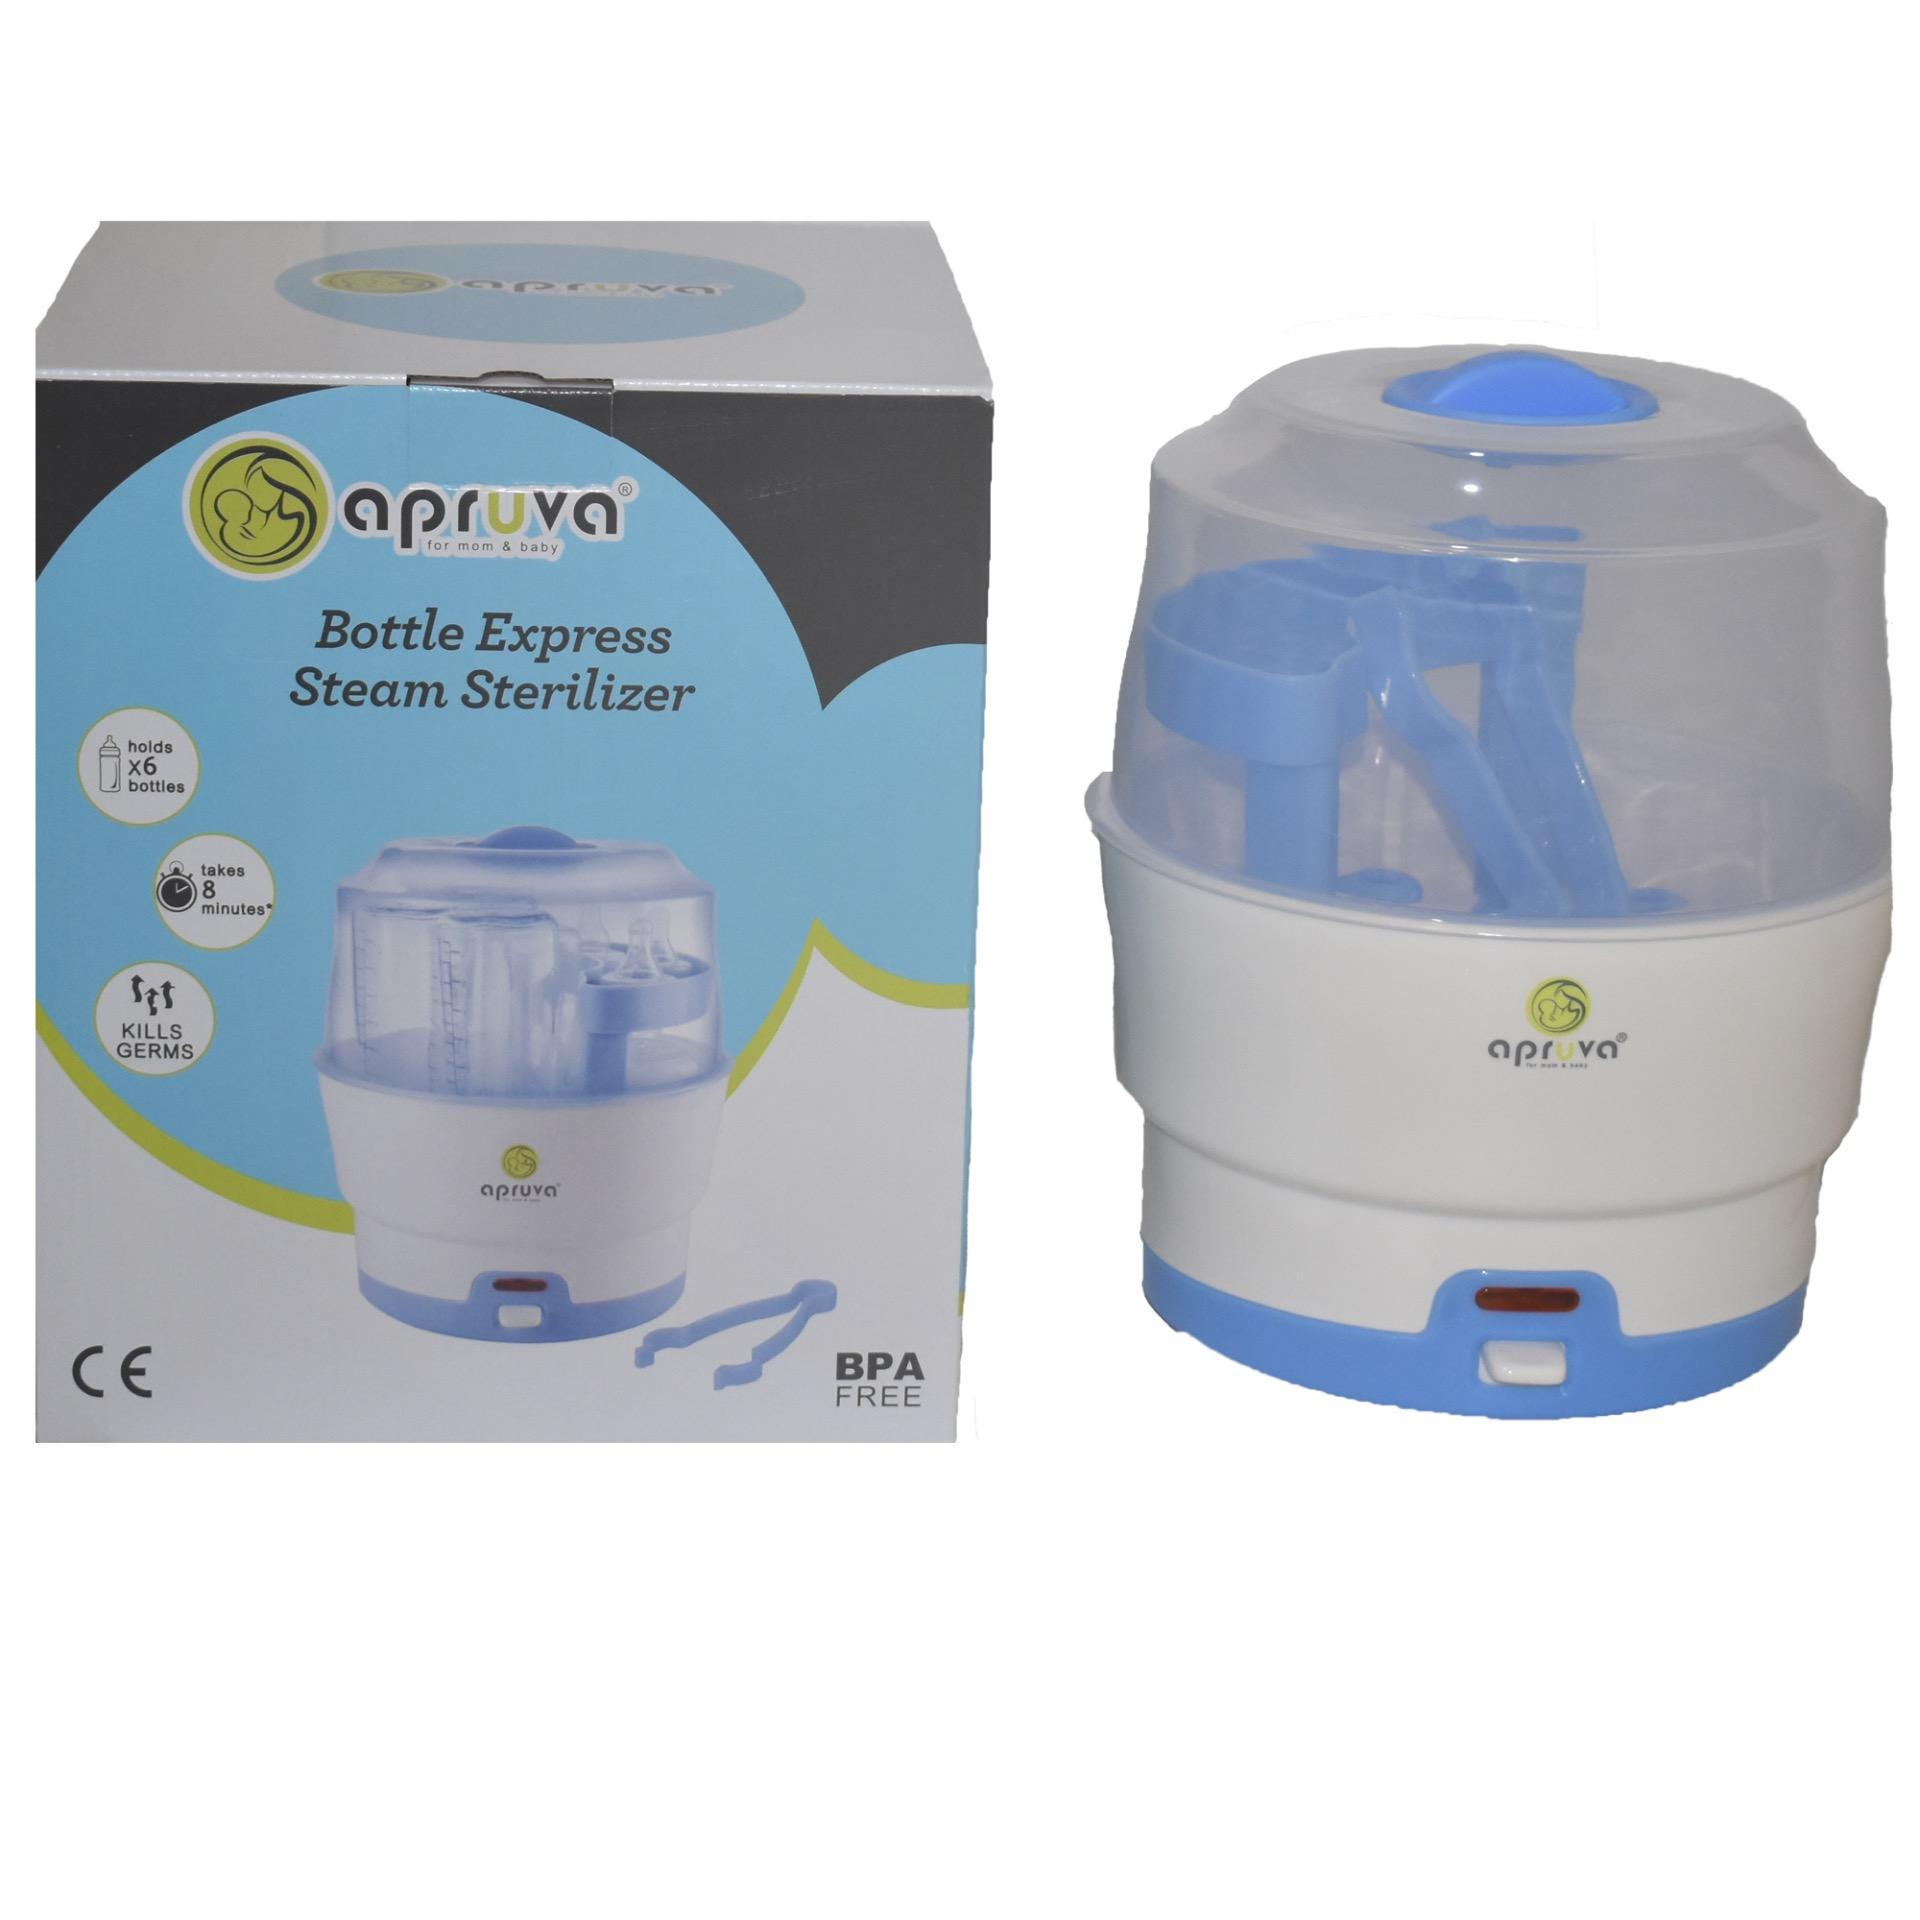 Philips Avent Bottle Sterilizer Scf92203 Alat Steril Botol Susu Tommee Tippee Dan Terlengkap Apruva Express Steam